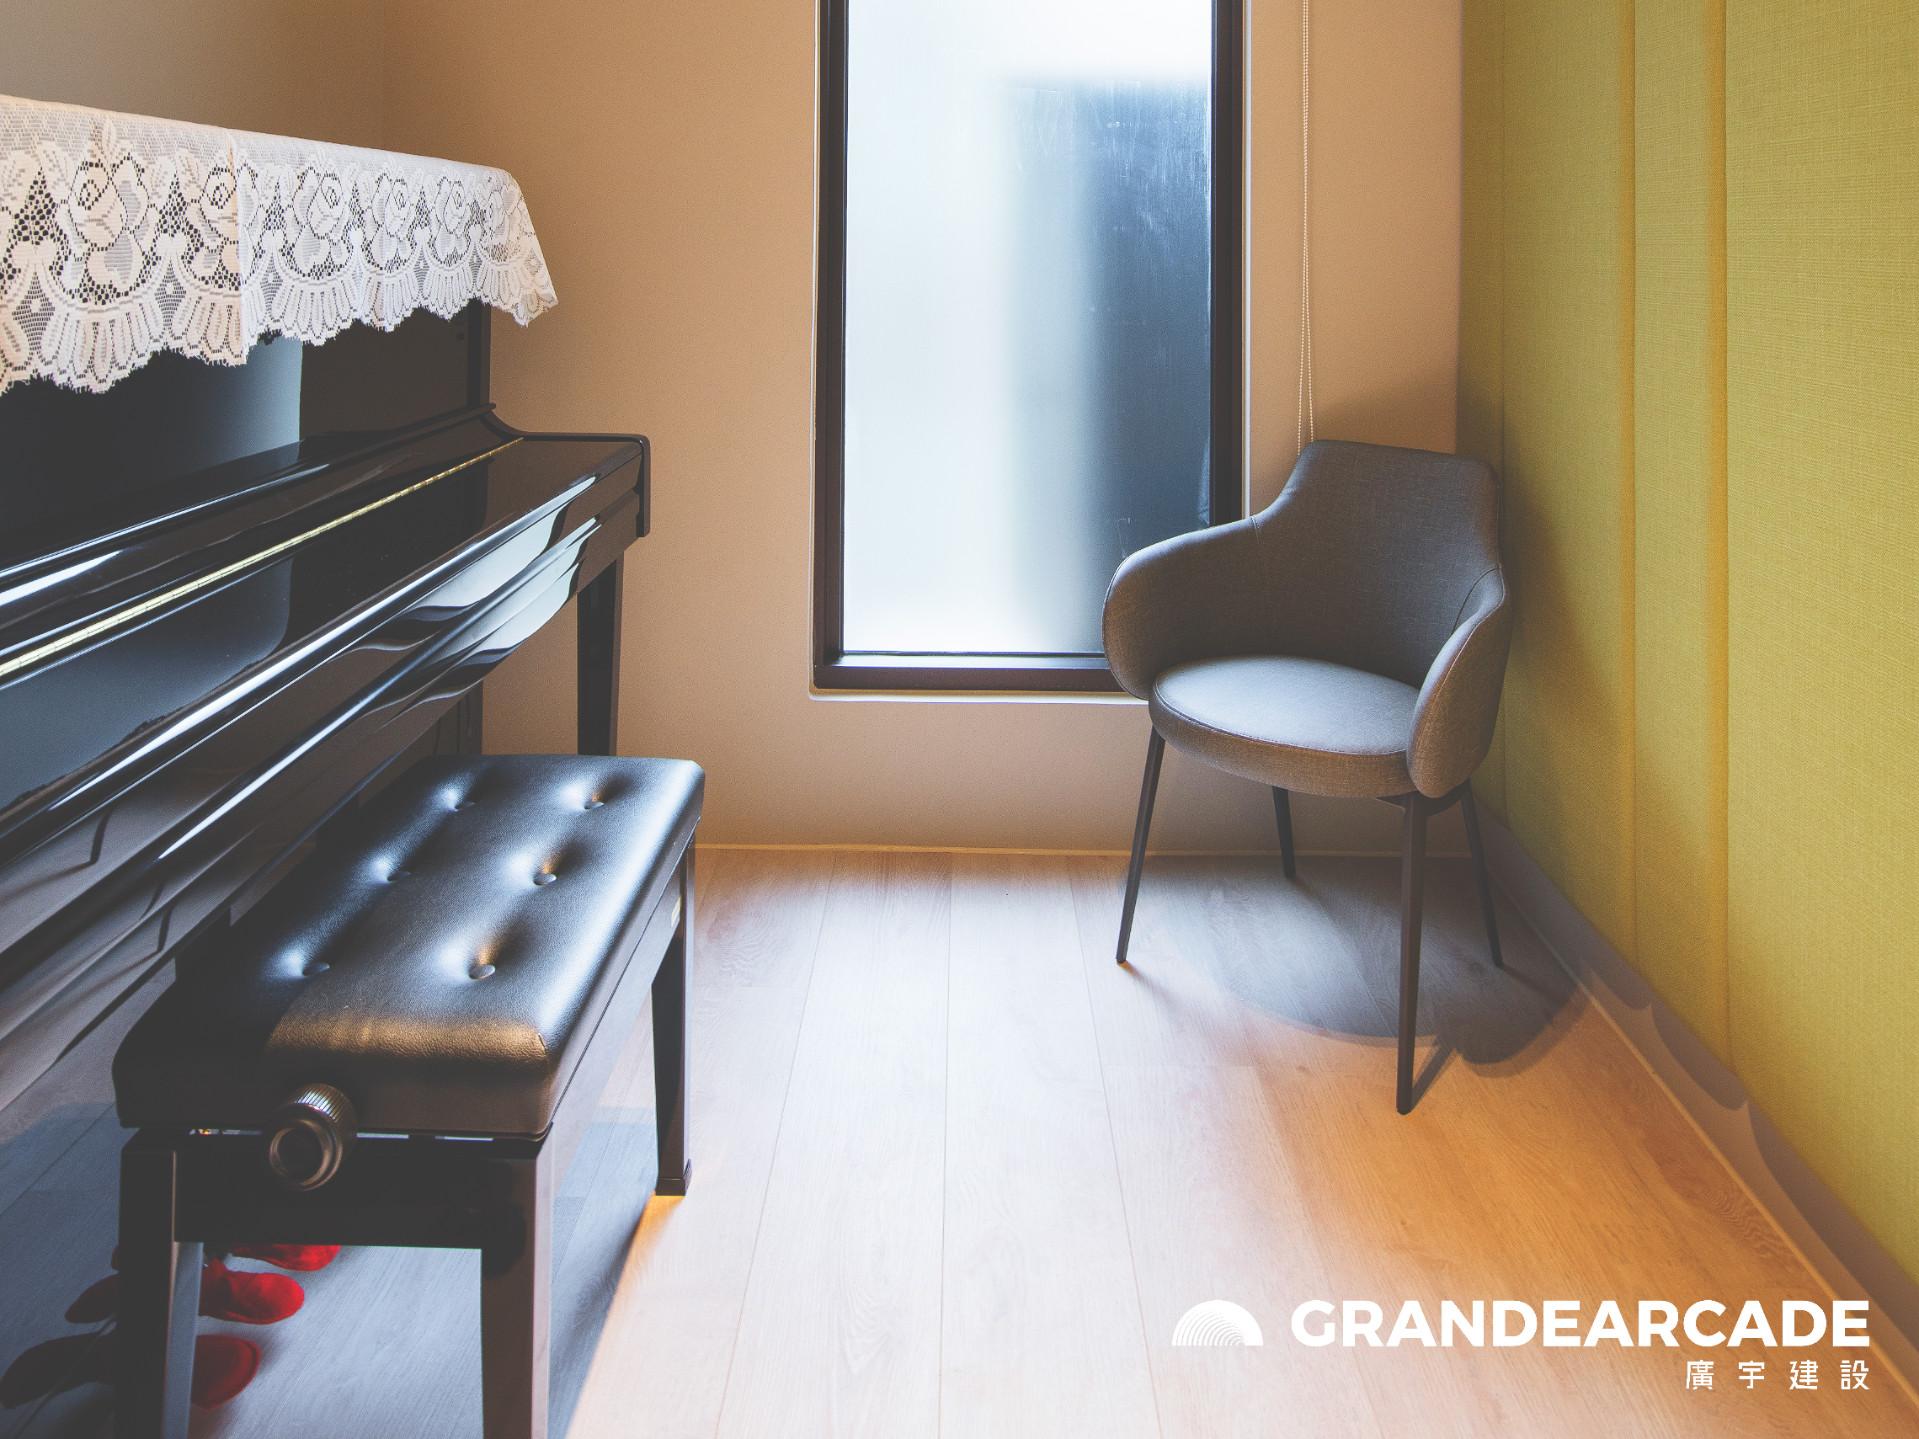 PianoRoom 琴房